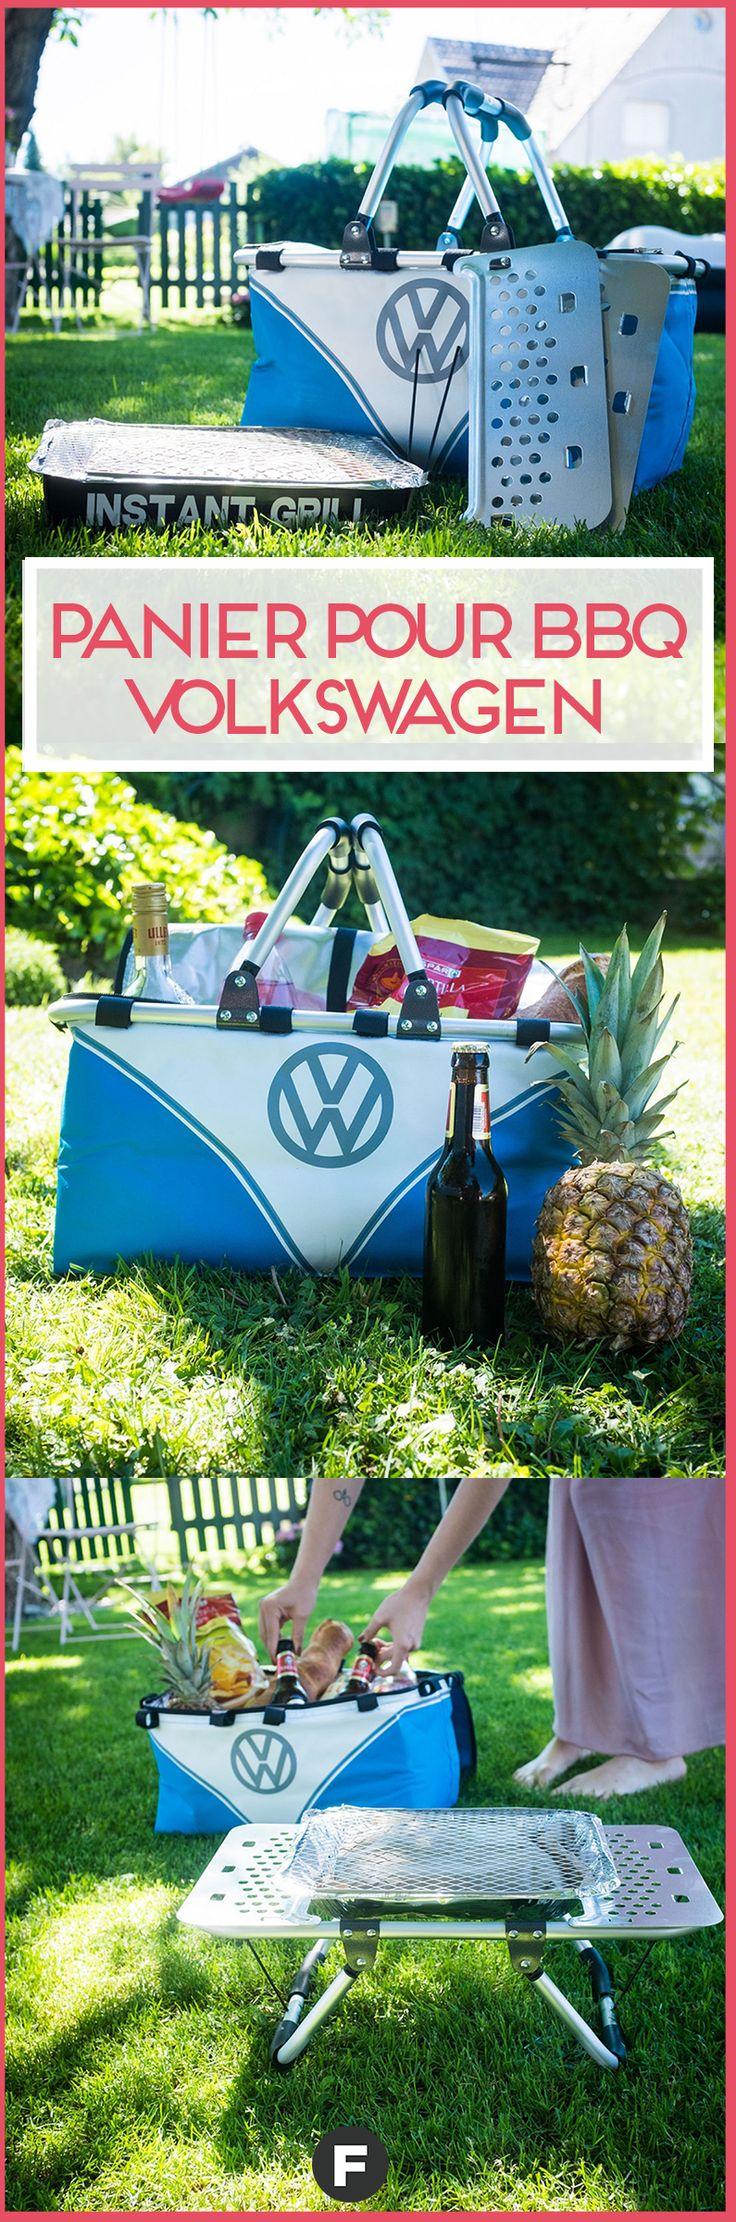 Le BBQ volkswagen s'emporte en camping comme un sac pratique et se tranforme en barbecue portatif ! #bbq #barbecue #volkswagen